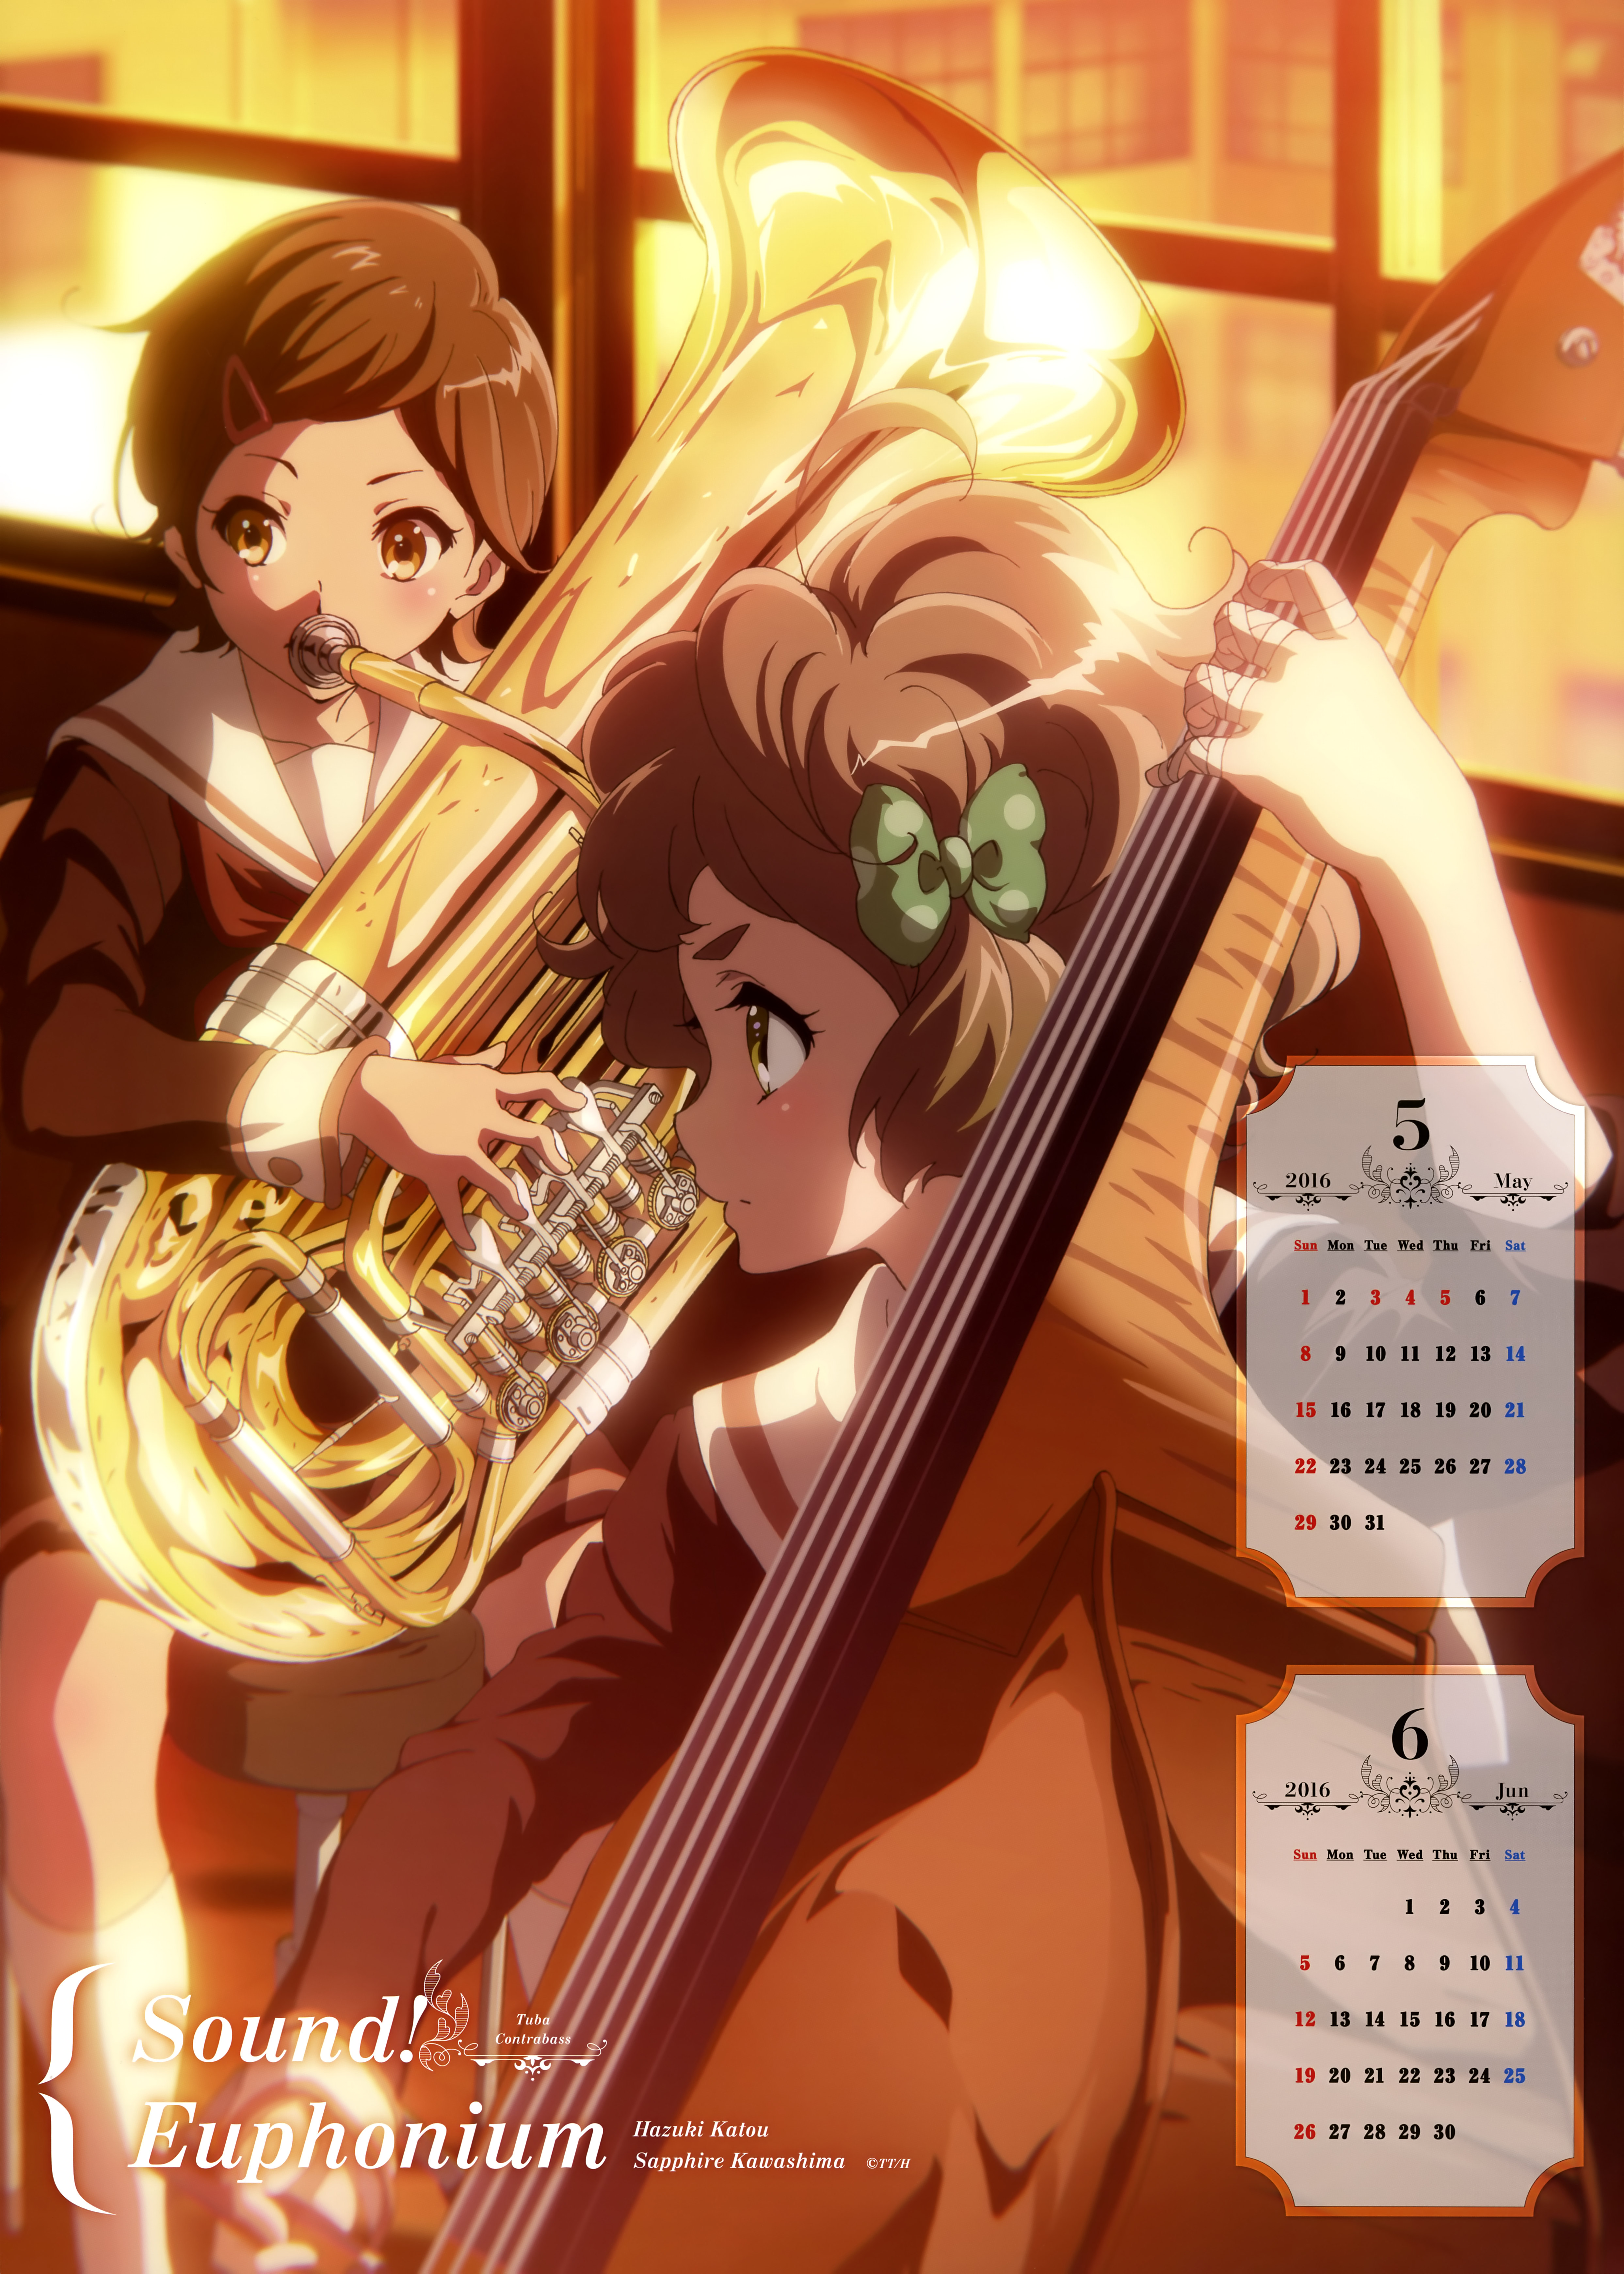 Hibike! Euphonium Anime calendar 2016 0003